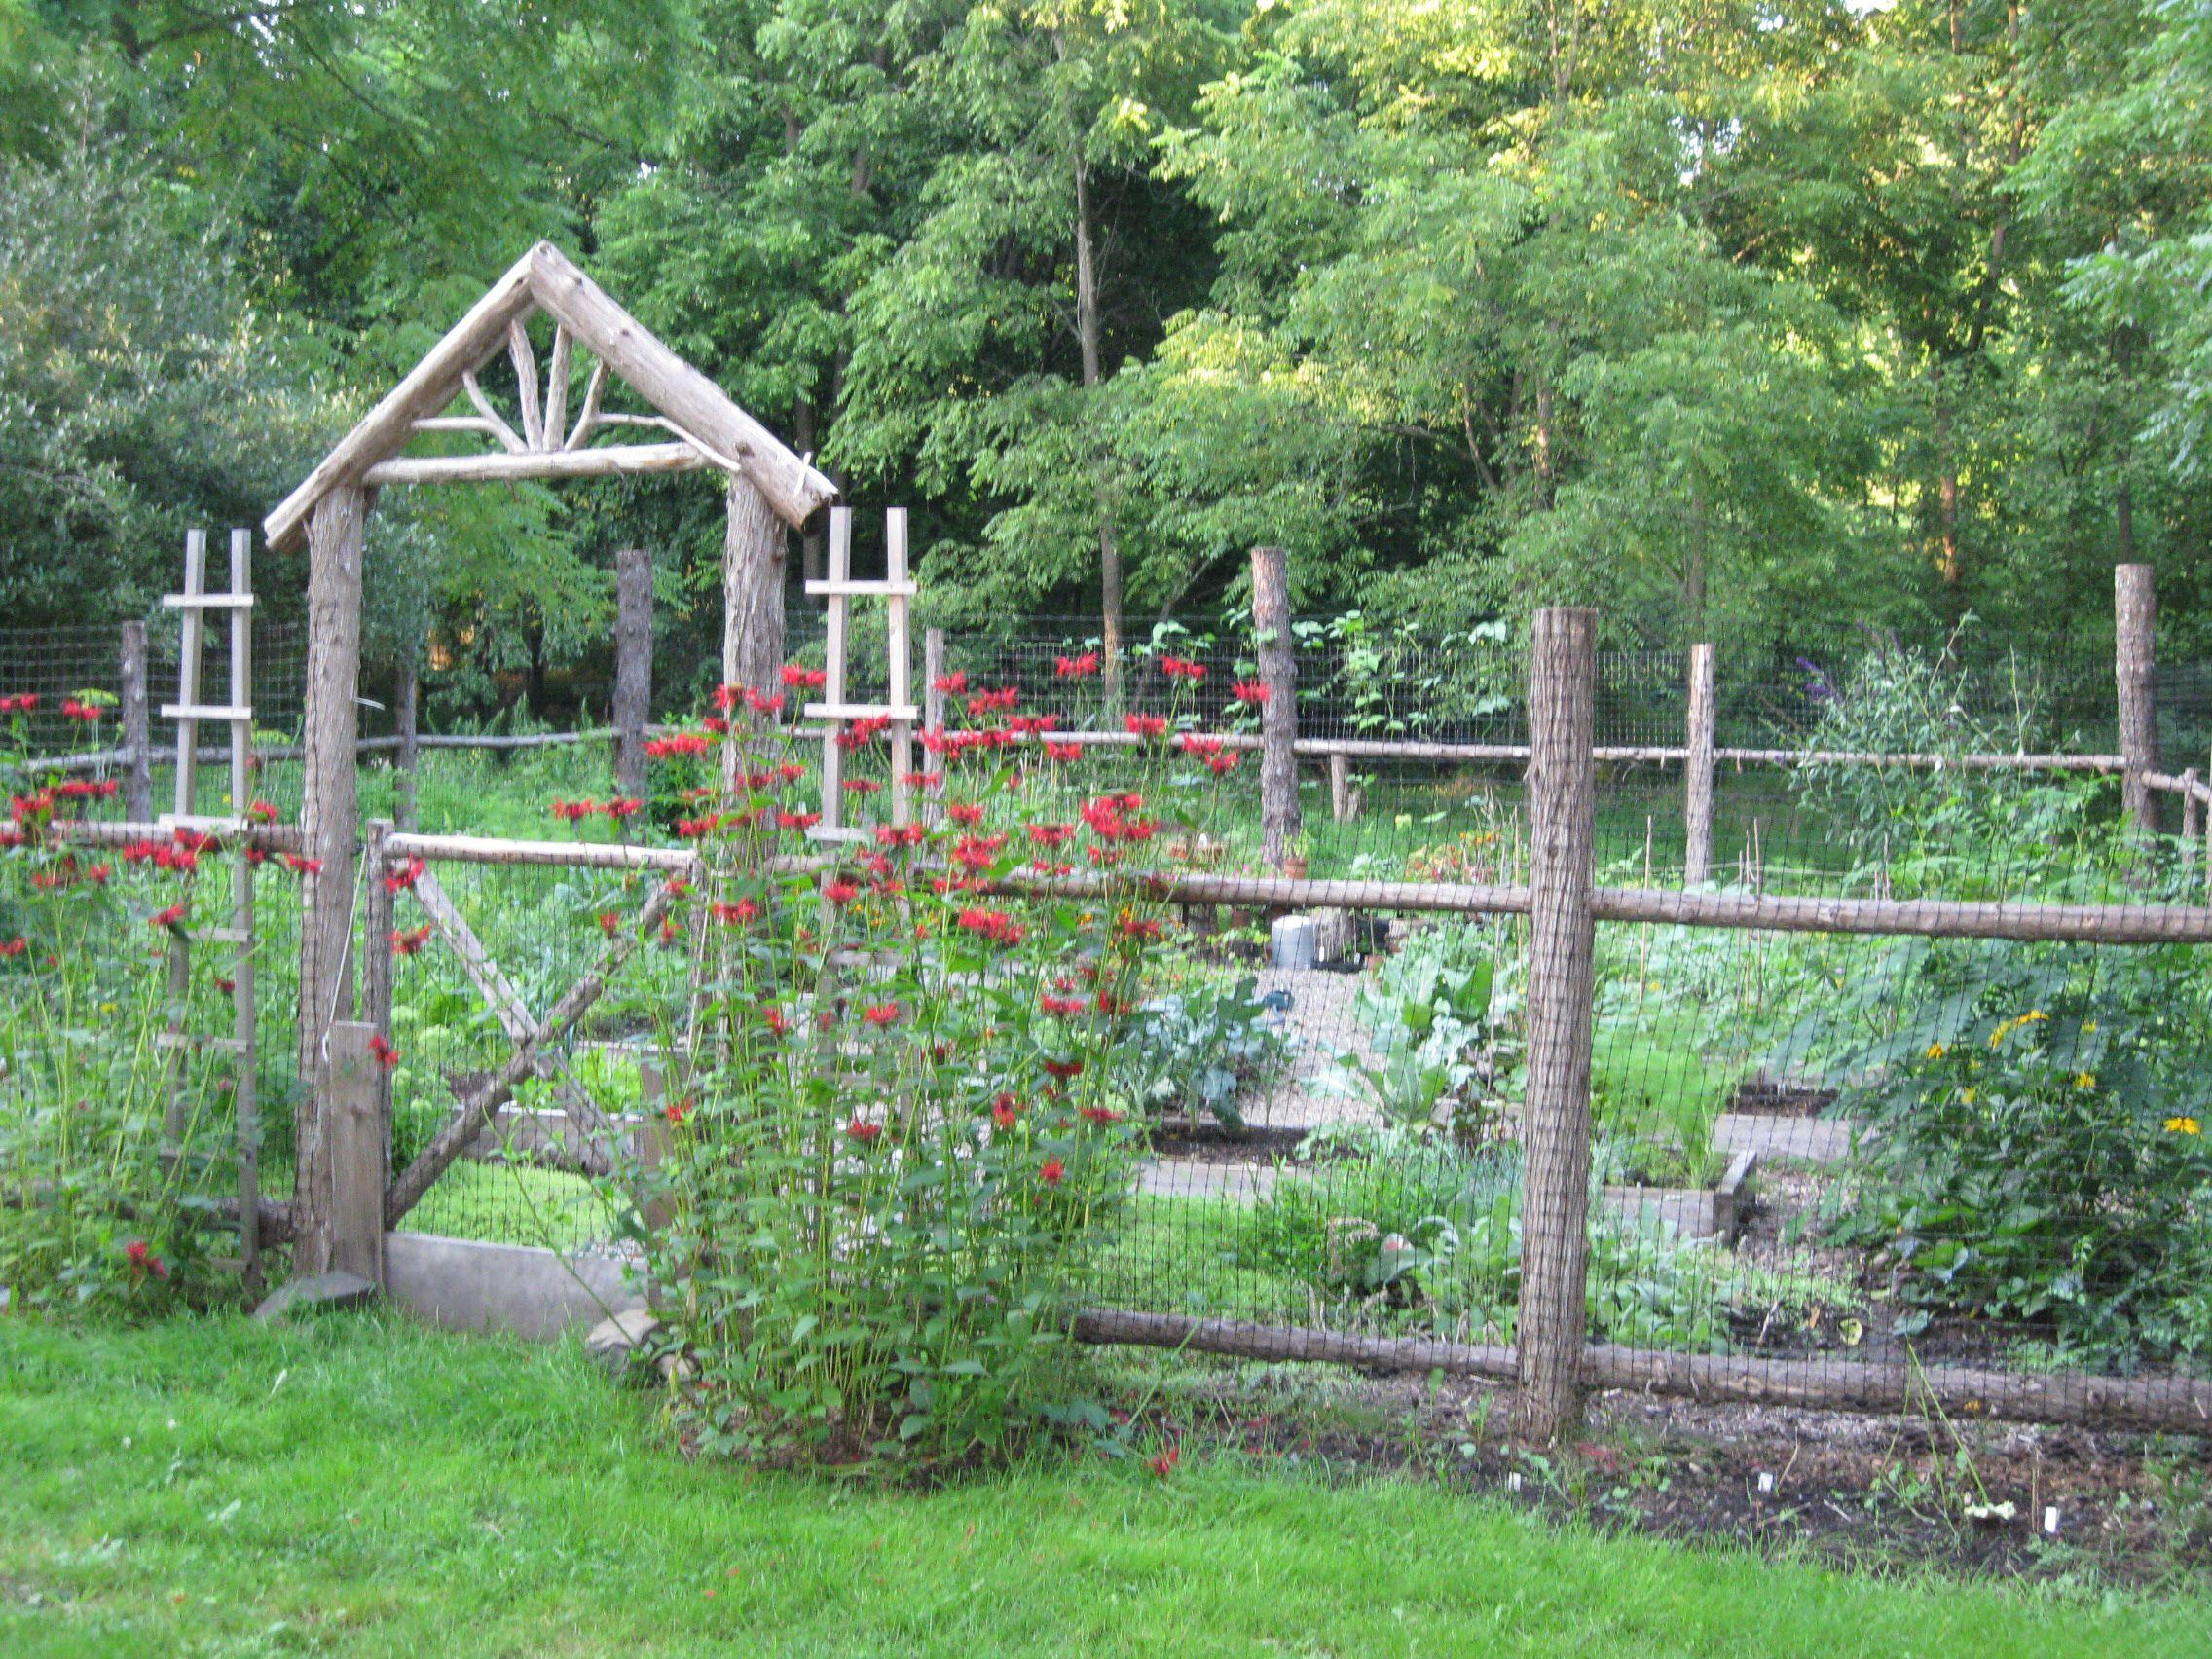 Image from http://lunar.thegamez.net/gardenidea/vegetable-garden ...